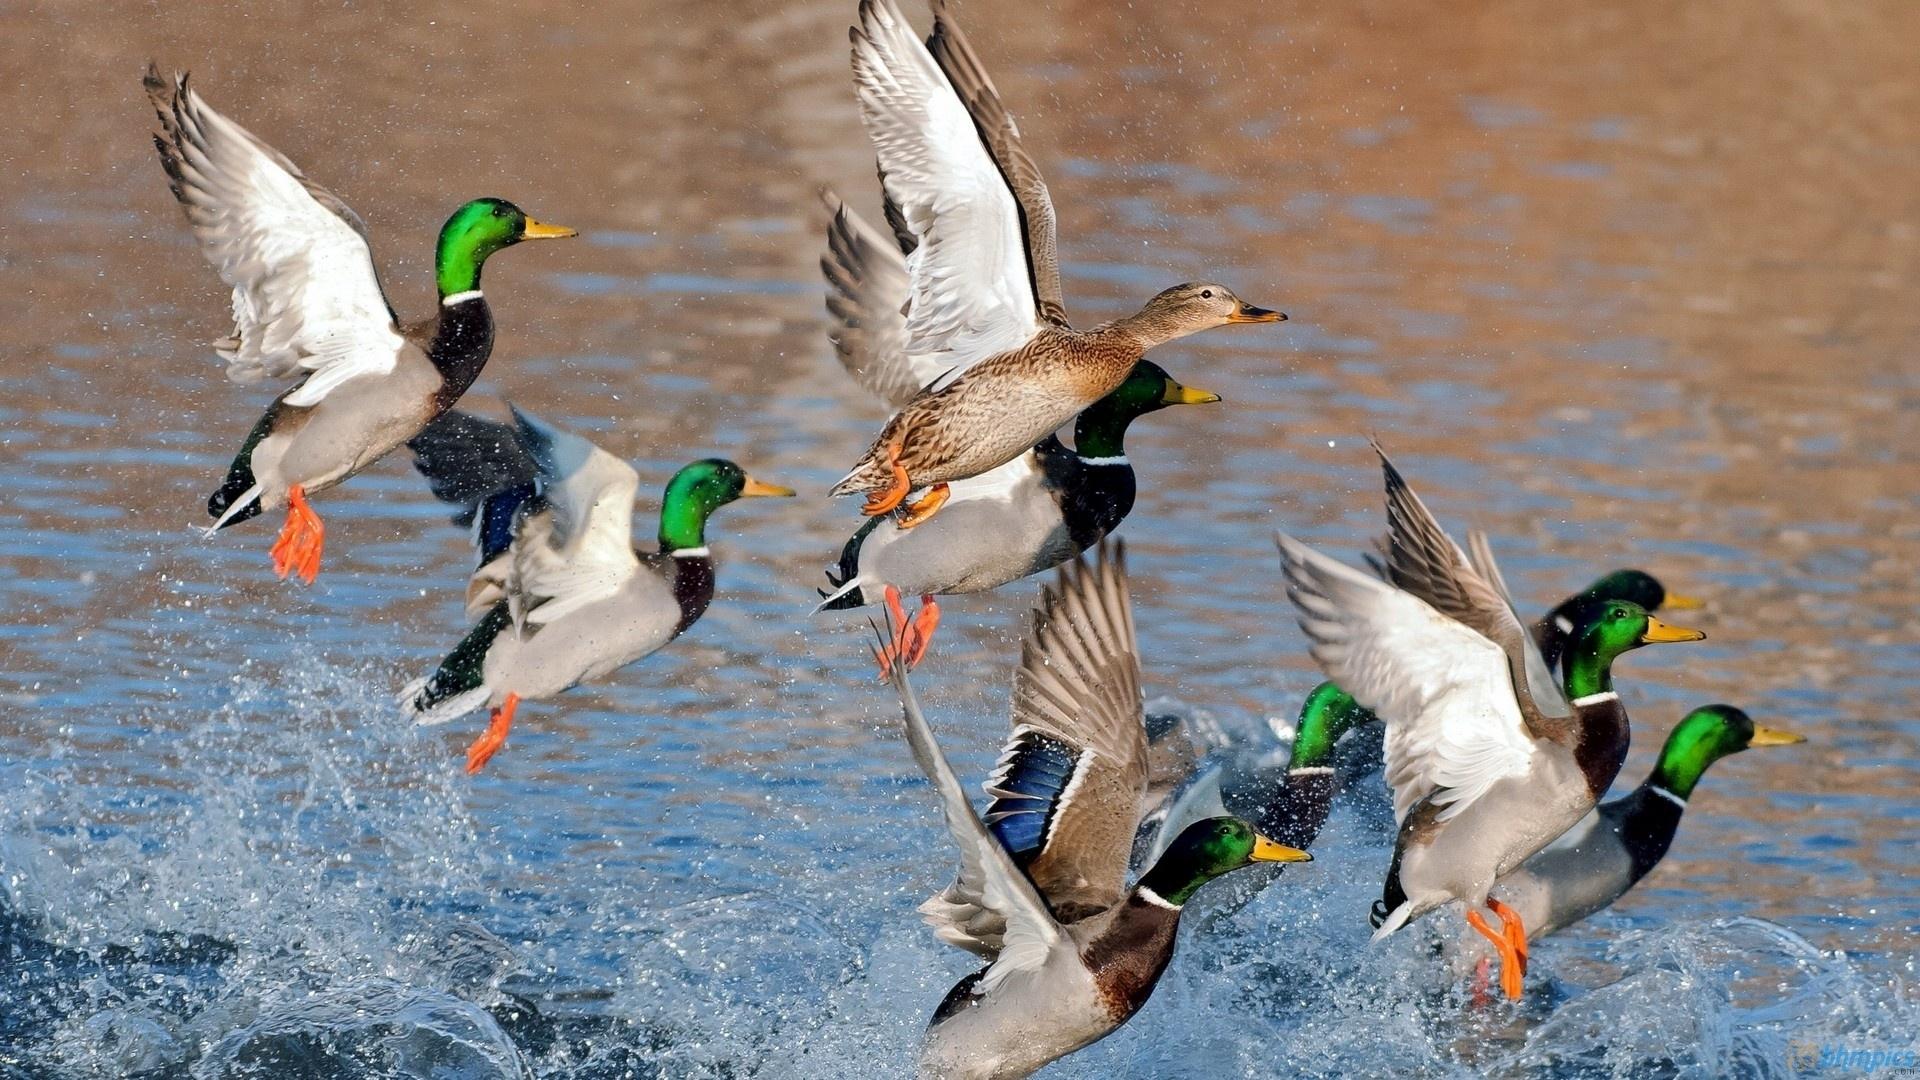 10 New Duck Hunting Desktop Wallpaper FULL HD 1920×1080 For PC Desktop